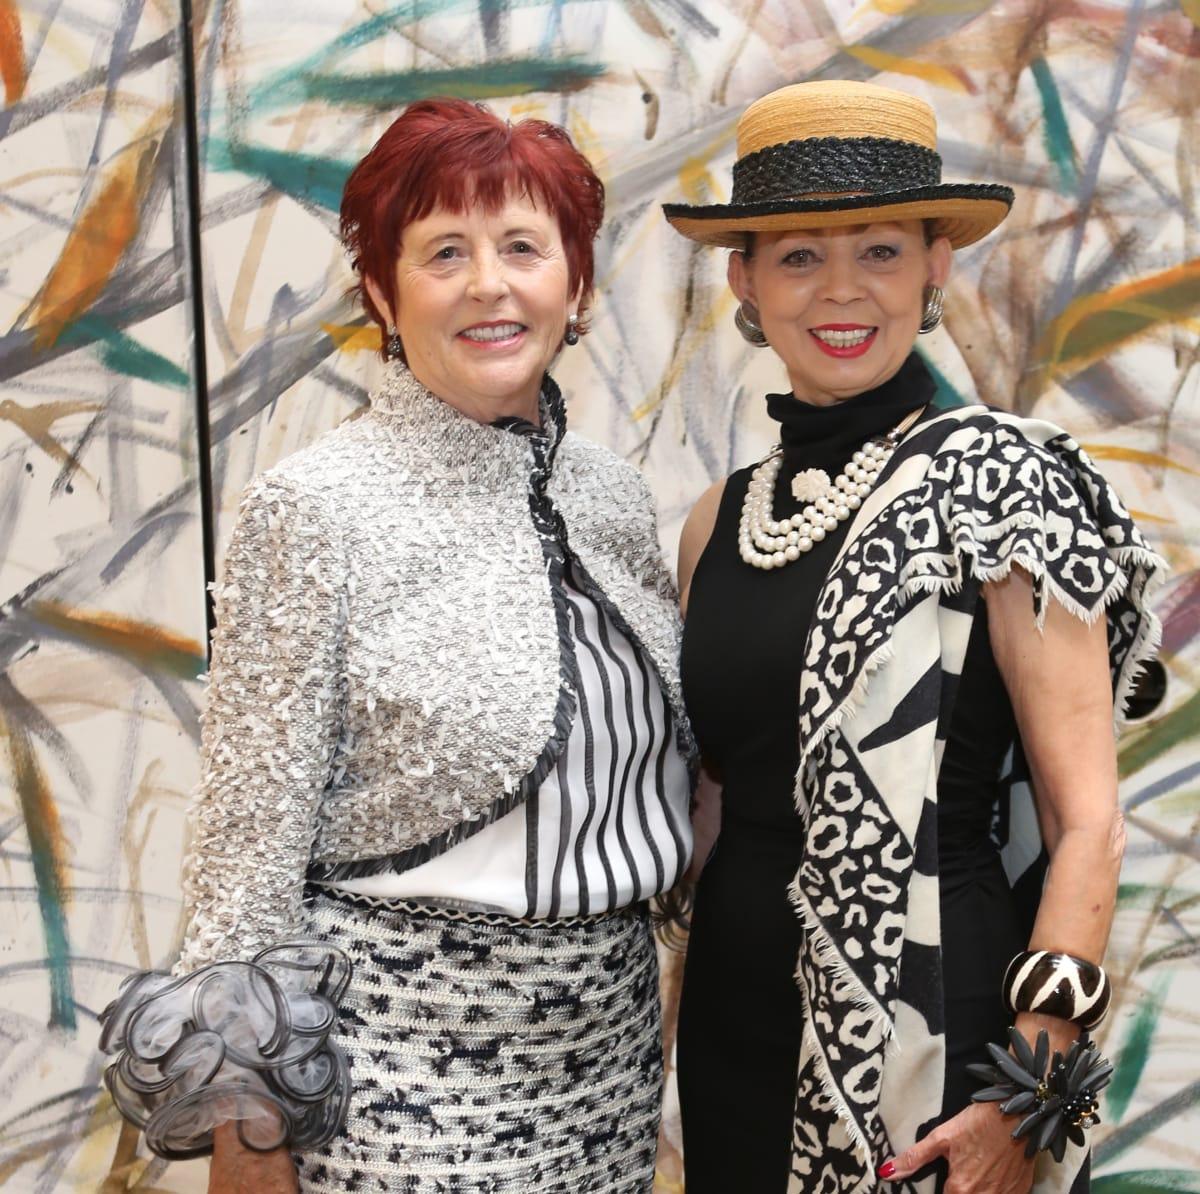 HGO Ball luncheon, March 2016, Irene Bourke, Danielle Ellis